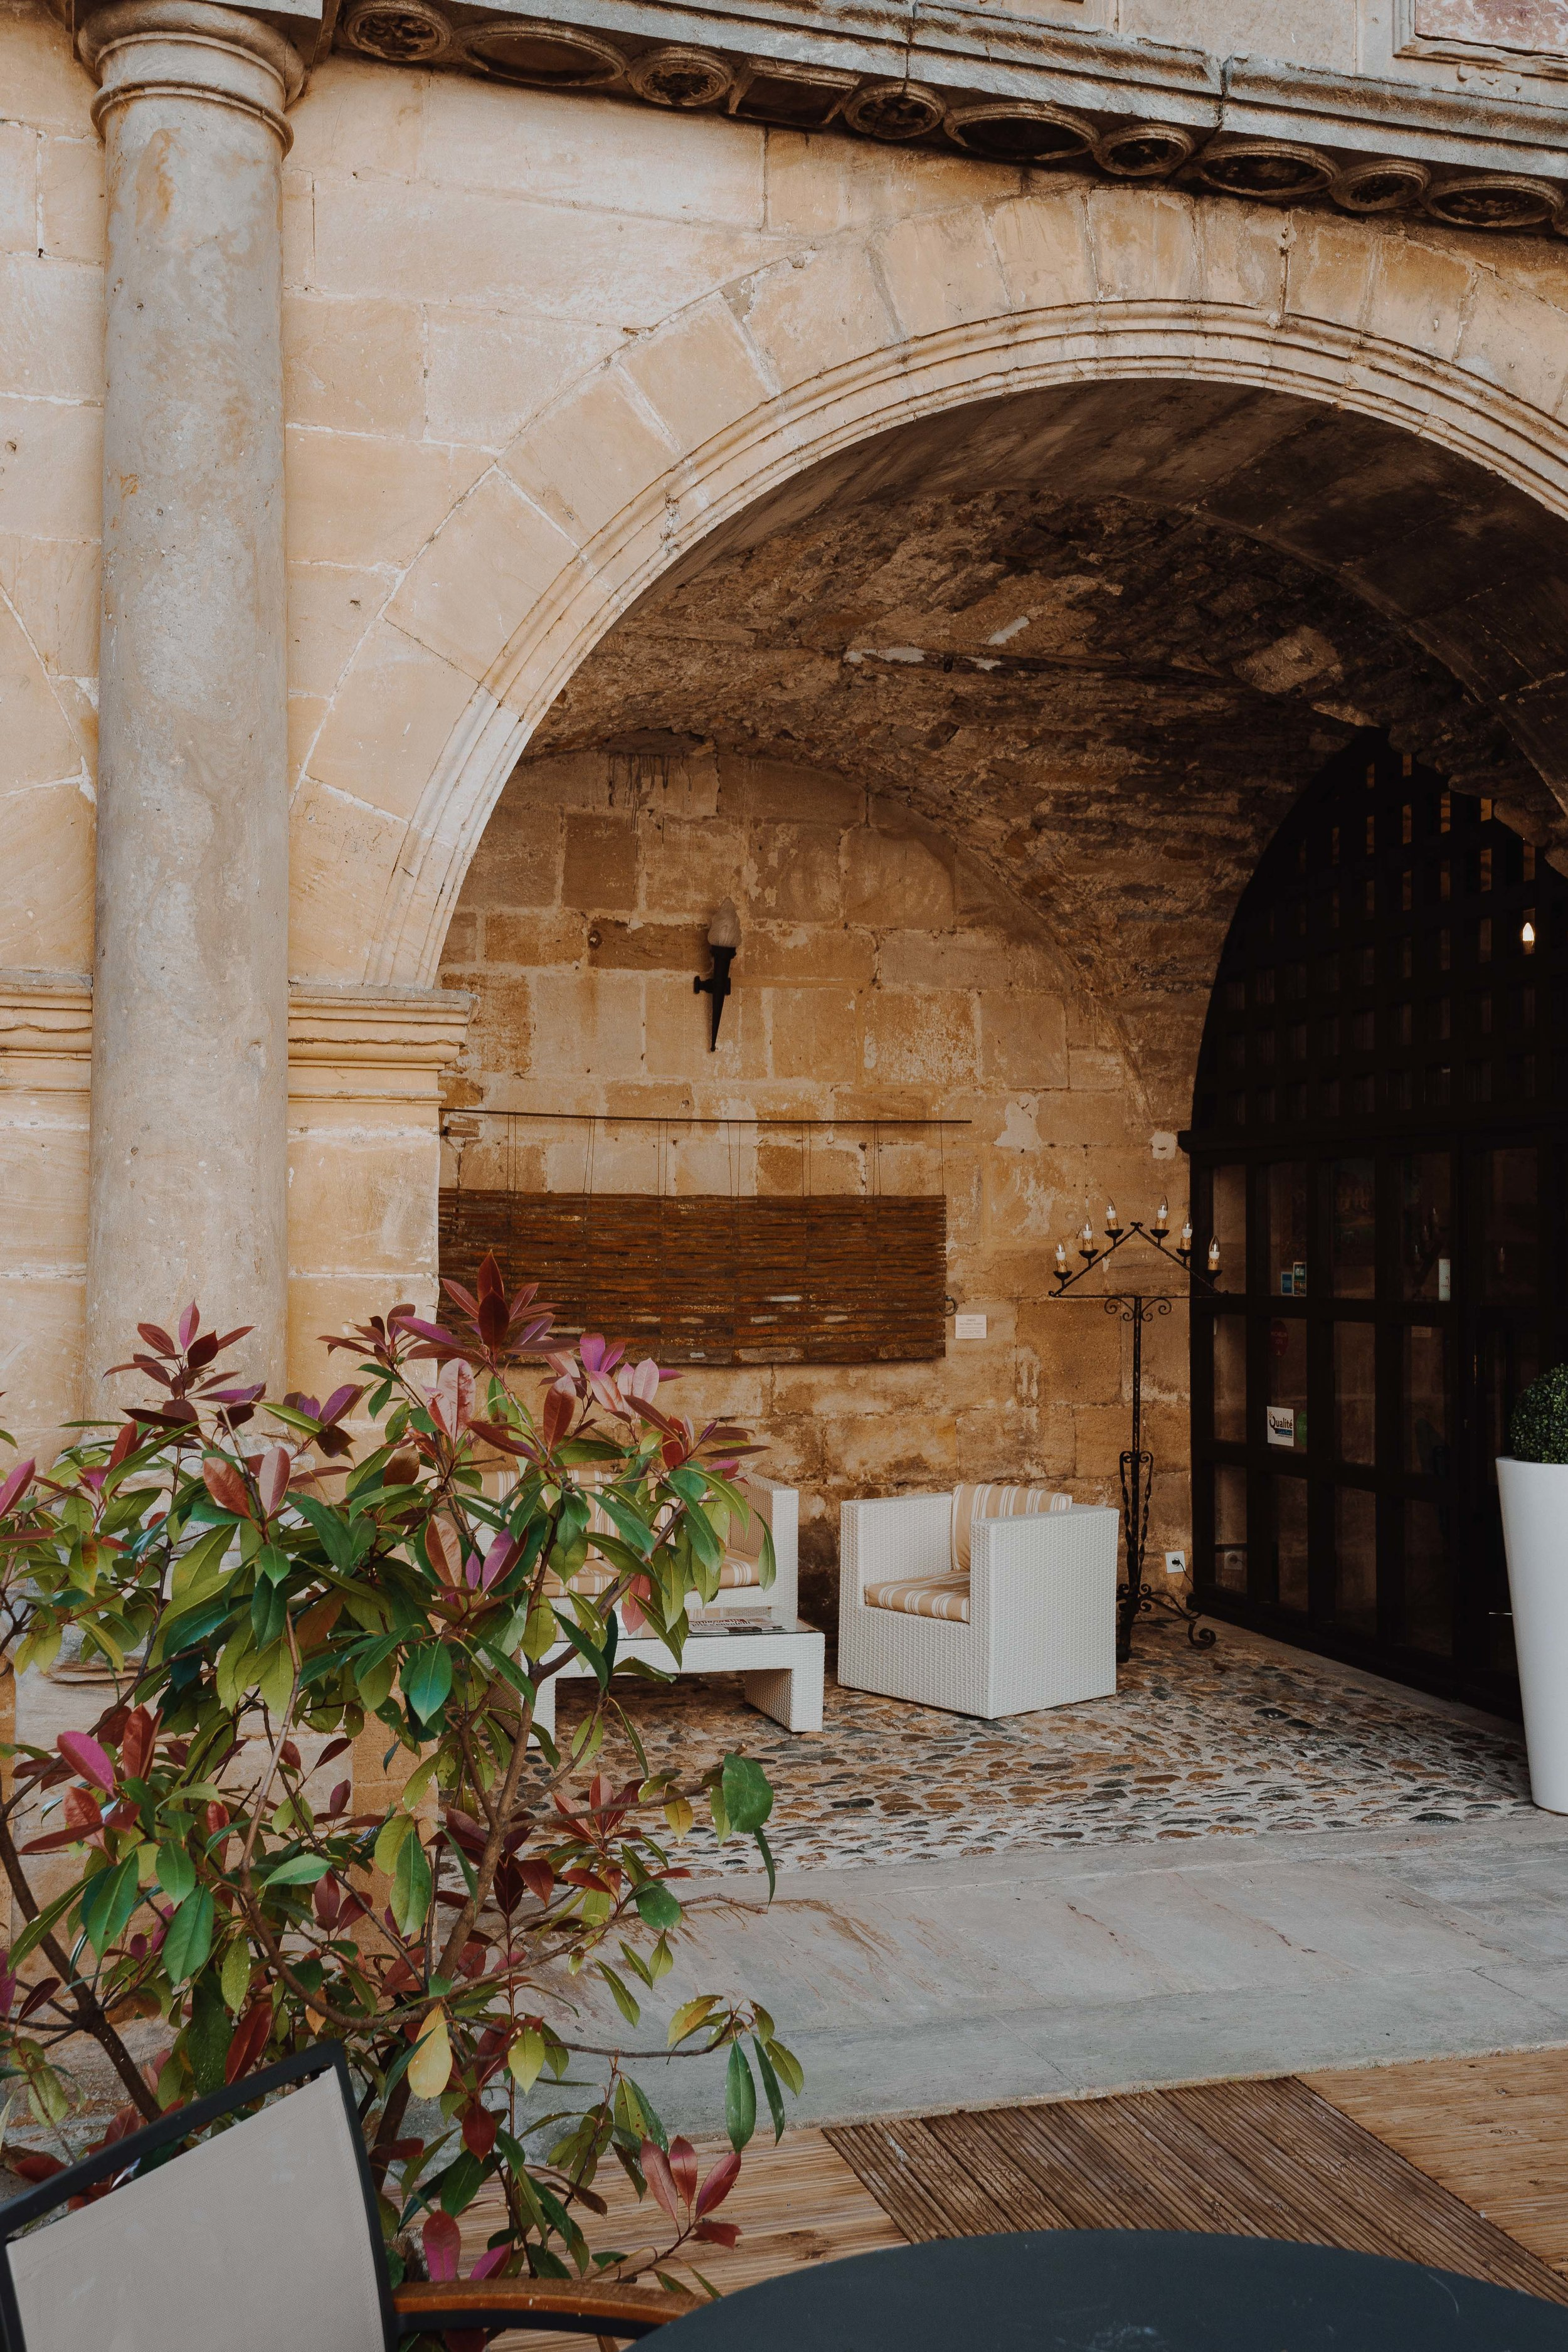 ASROSENVINGE_AtoutFrance_Occitanie_Toulouse_LowRes-223.jpg